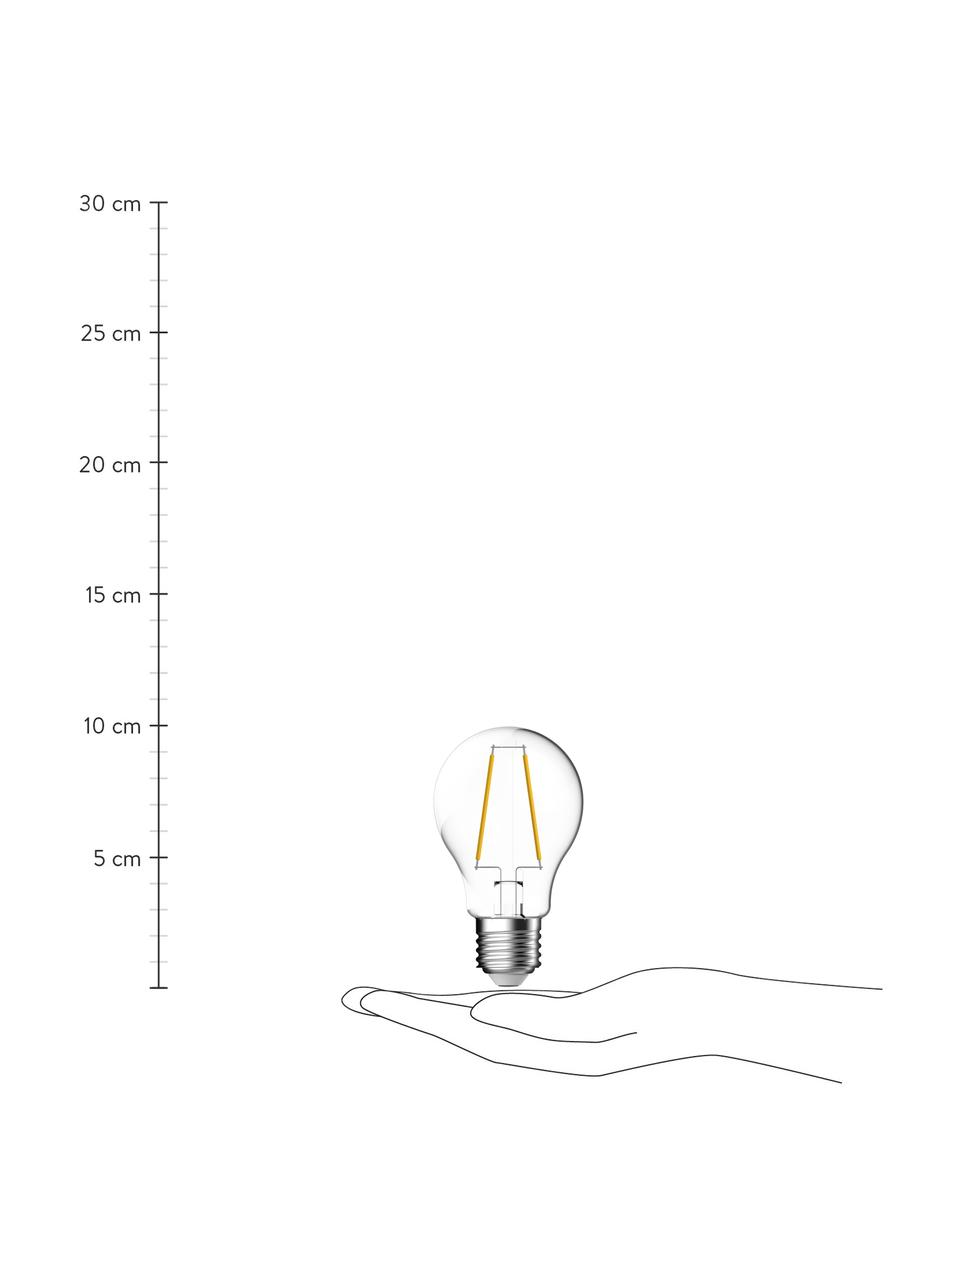 E27 peertje, 7 watt, warmwit, 1 stuk, Peertje: glas, Fitting: aluminium, Transparant, Ø 6 x H 10 cm